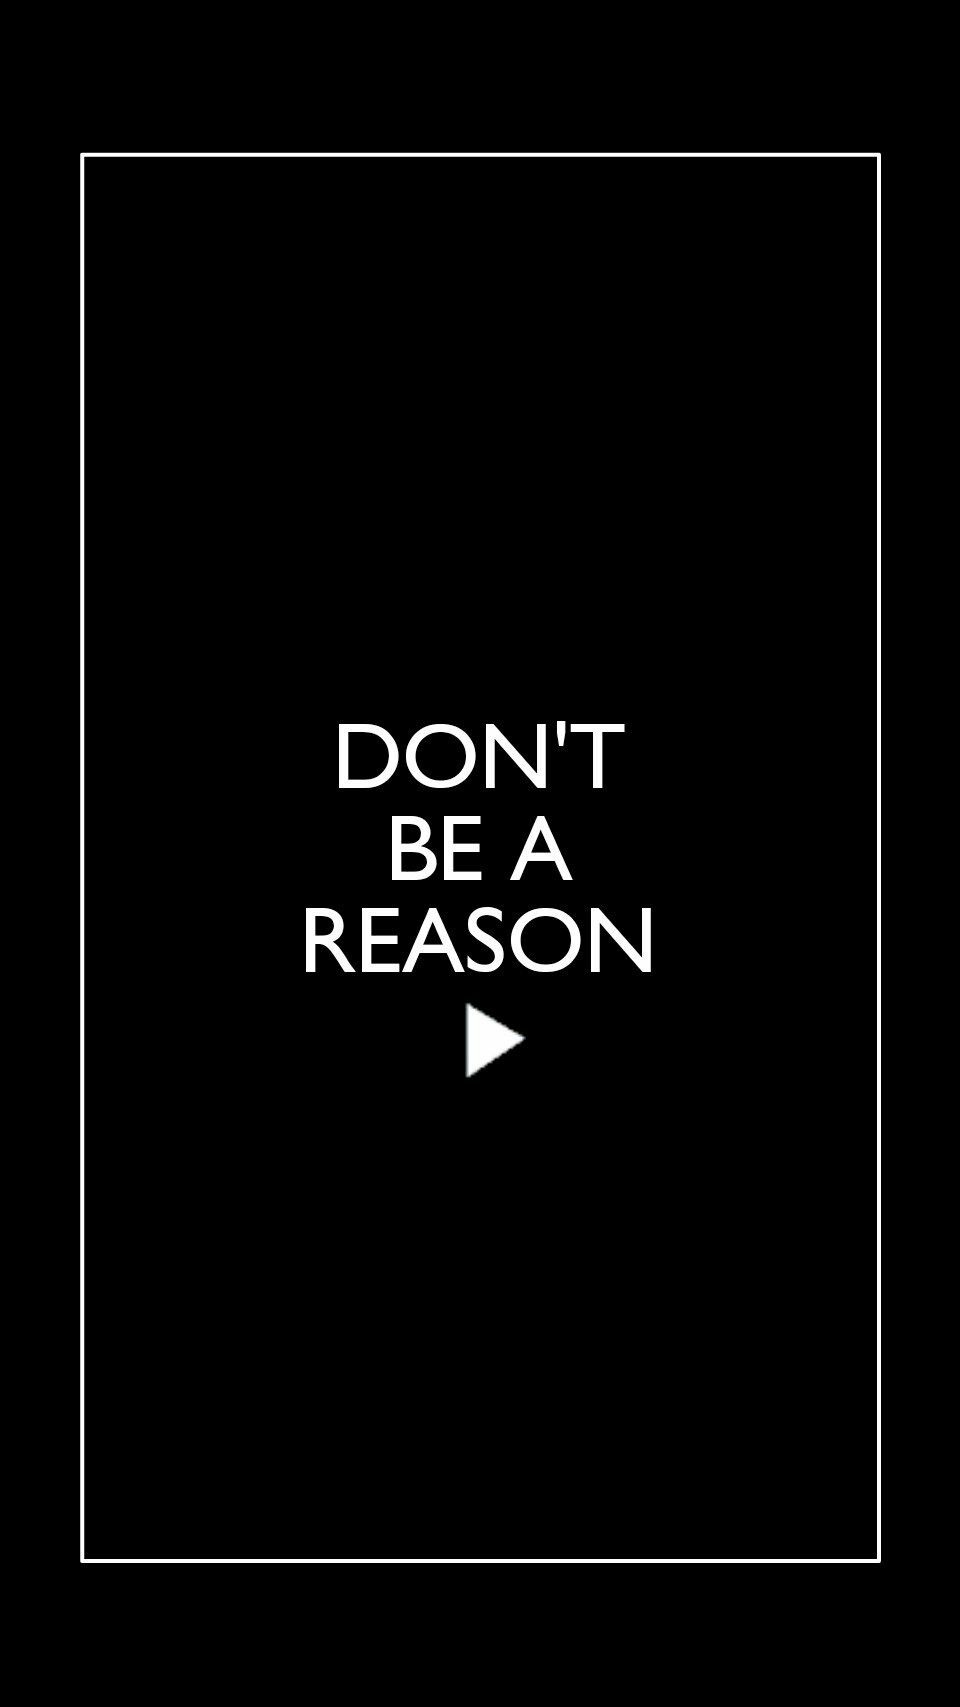 Resultado de imagen para 13 reasons why wallpaper   Wallpapers   Pinterest   13 reasons ...